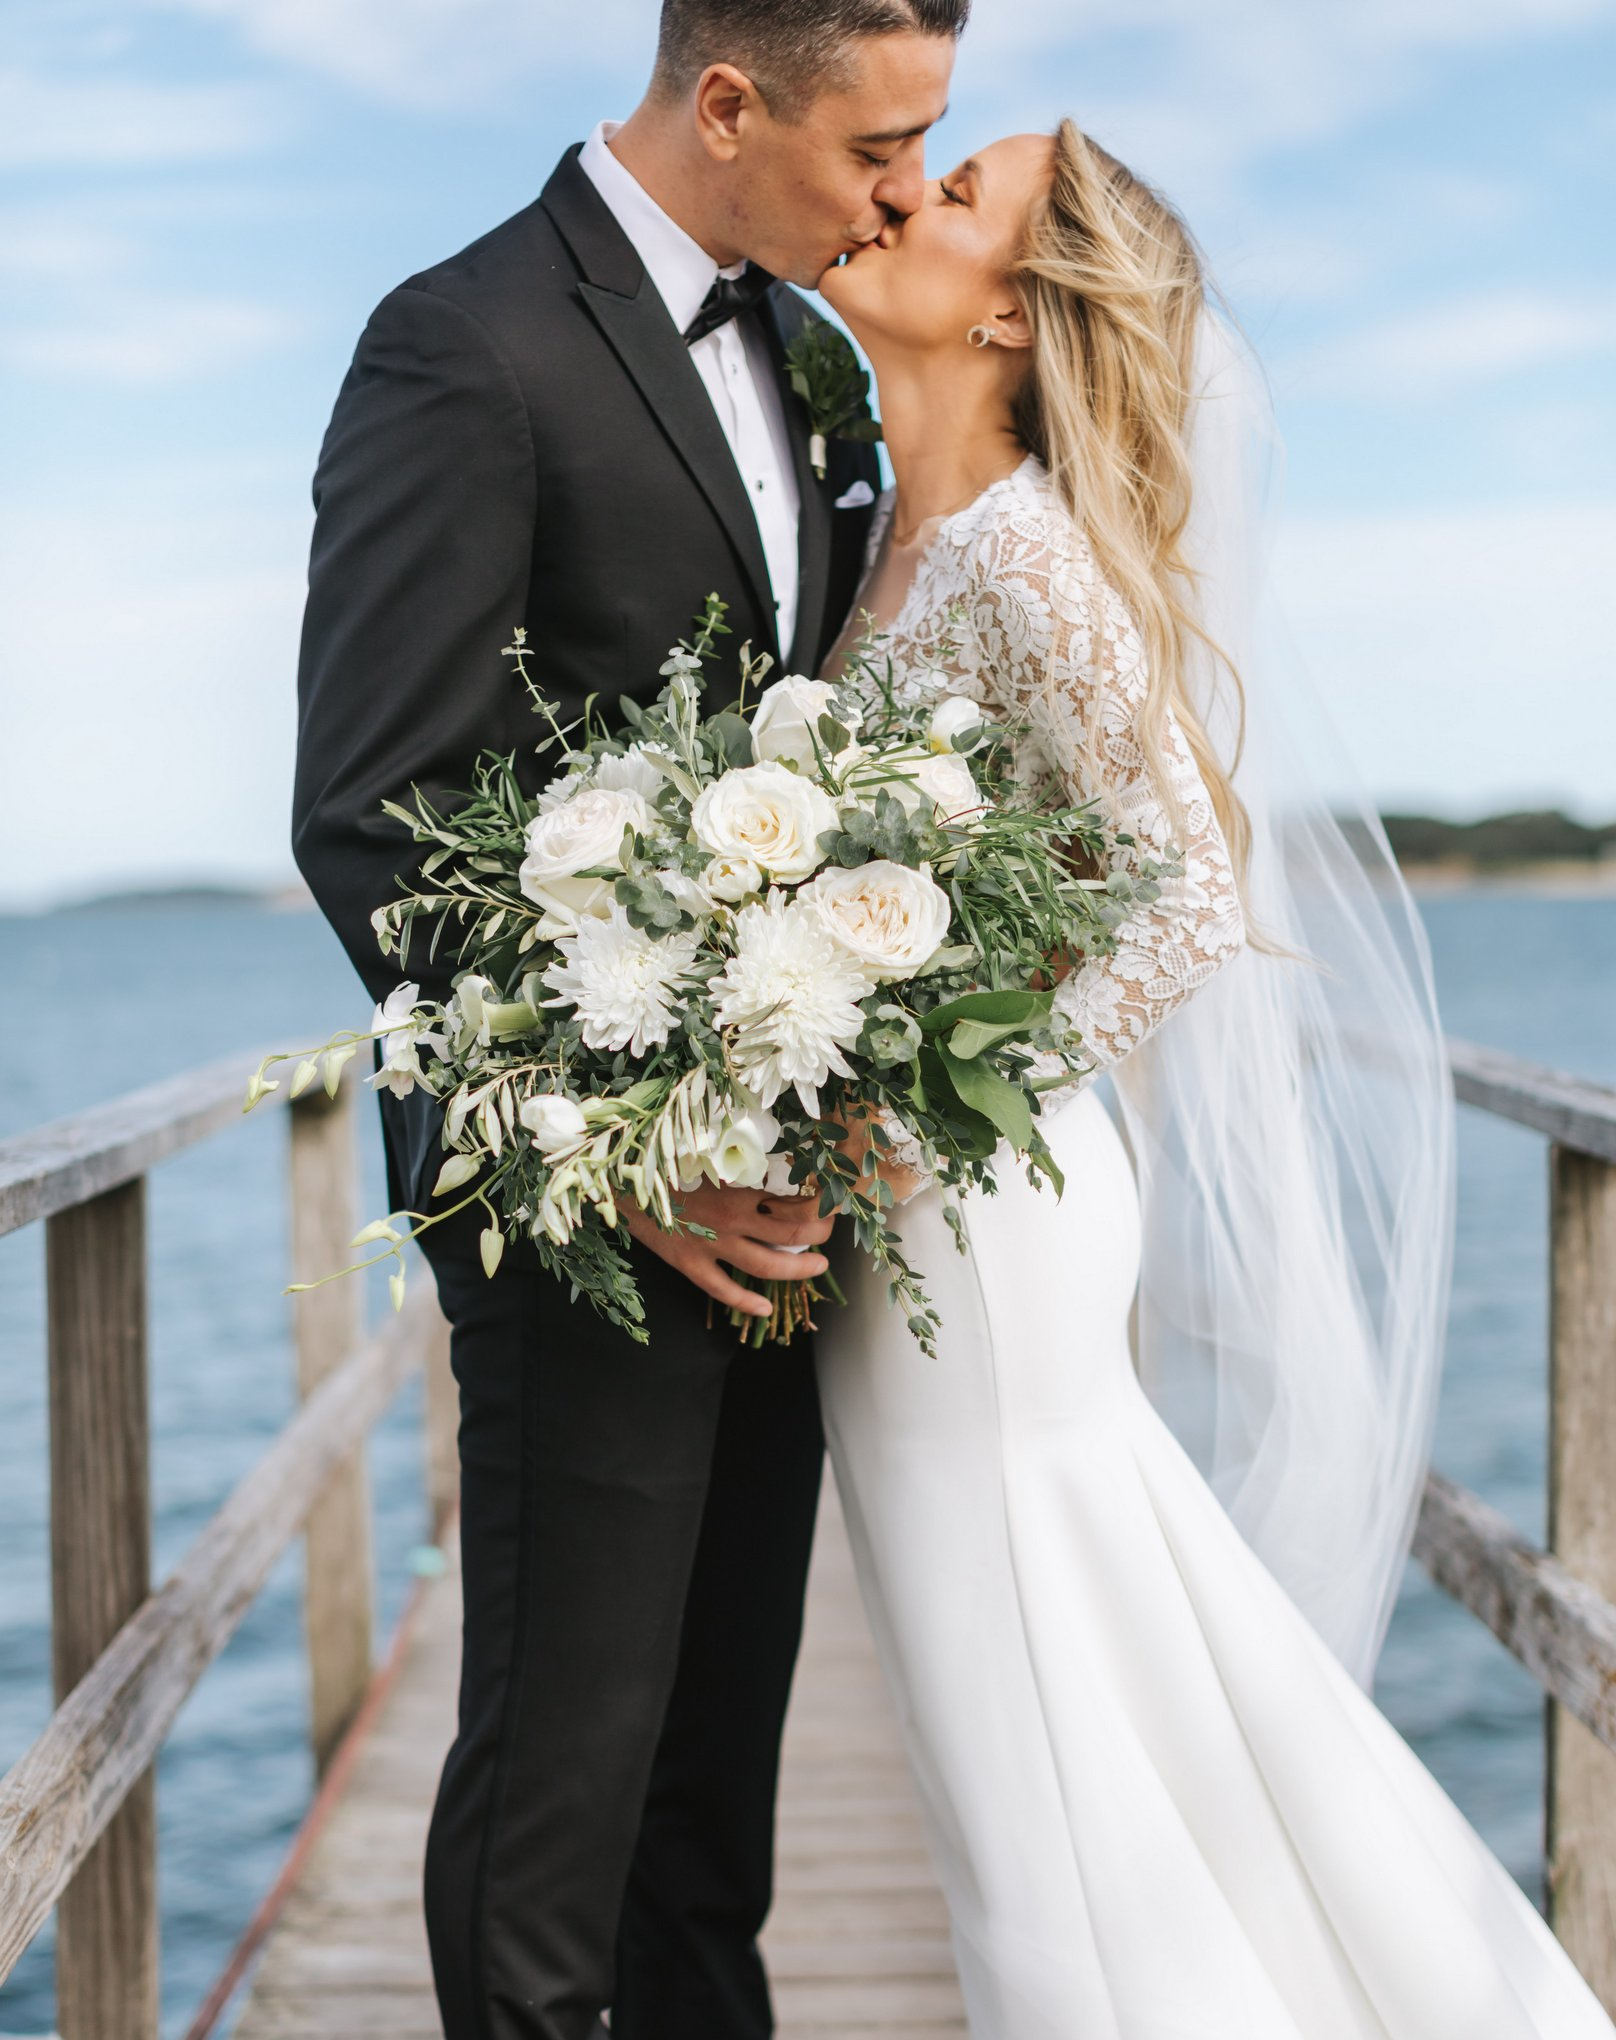 Wequassett-Wedding-Photographer-Cape-Cod-Boston-Lena-Mirisola-10.jpg